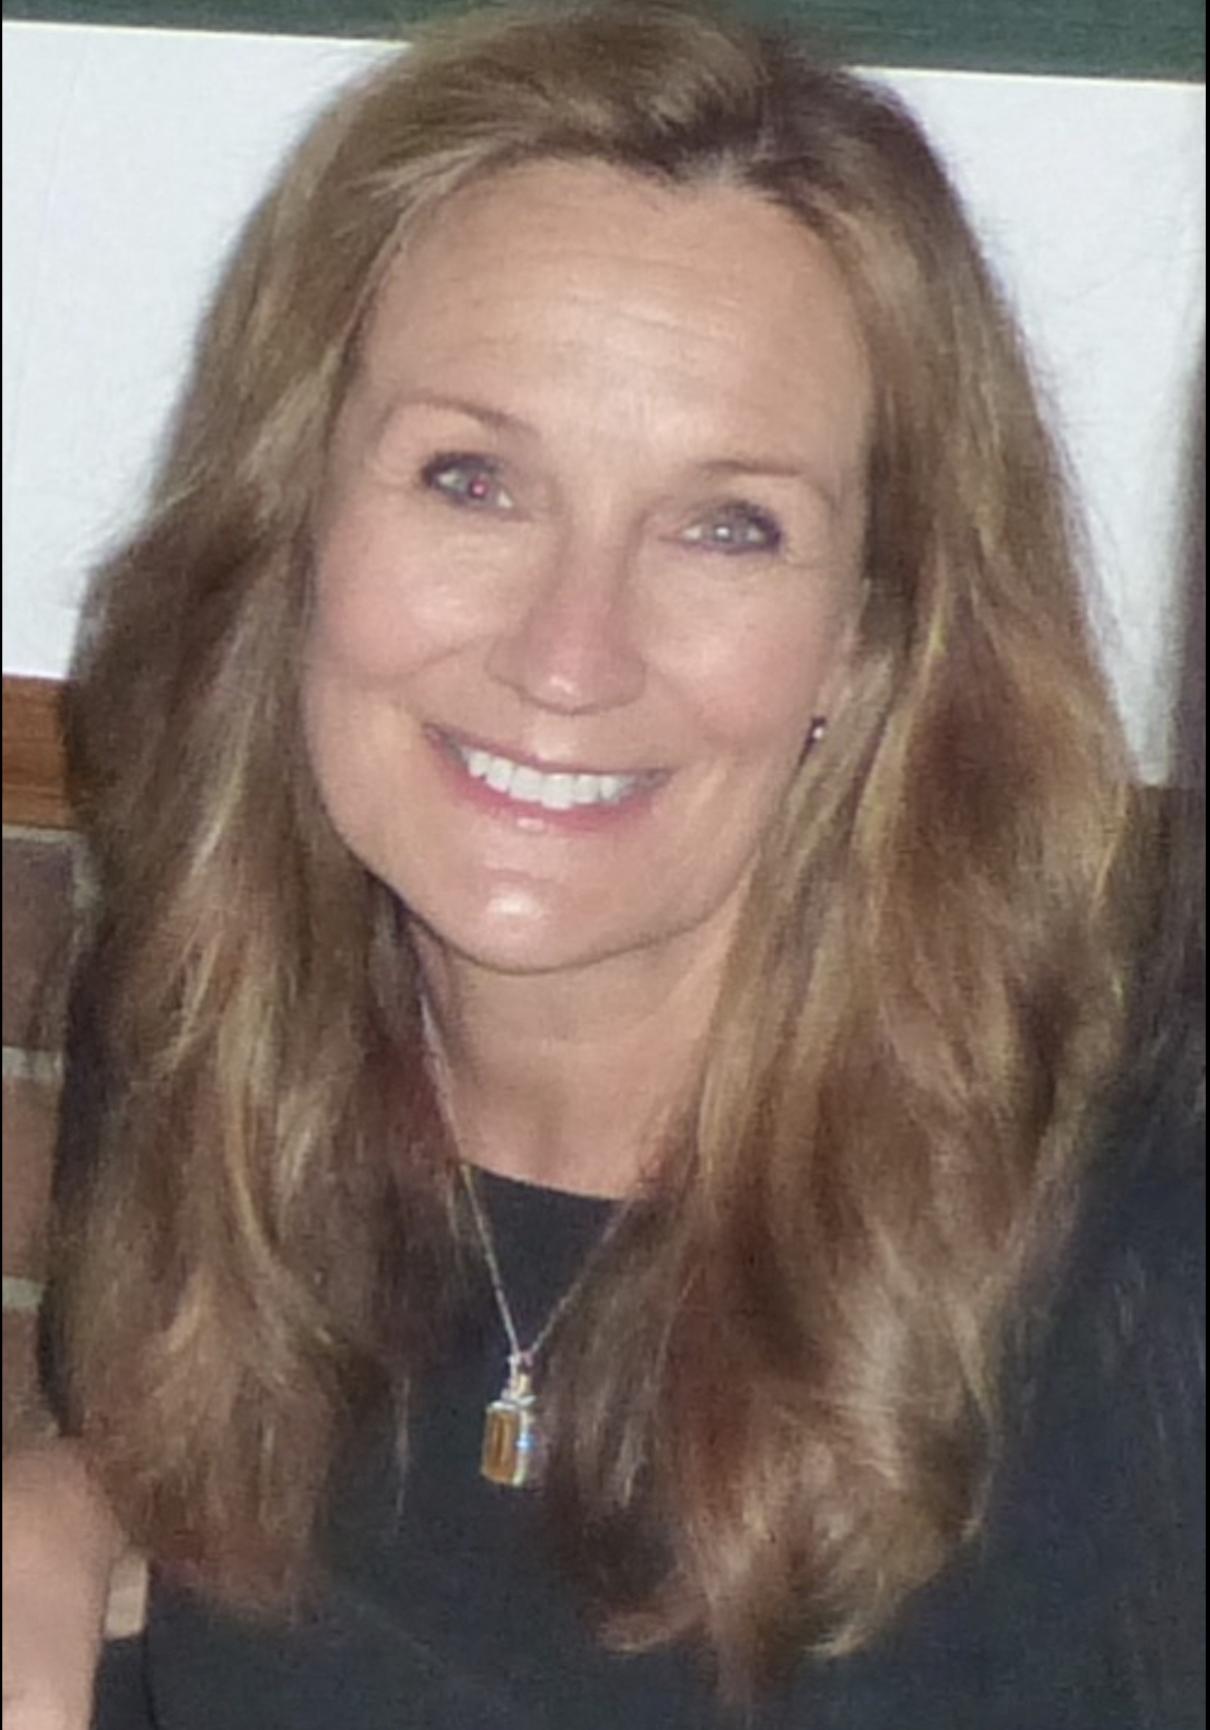 Melinda Vidal Myers